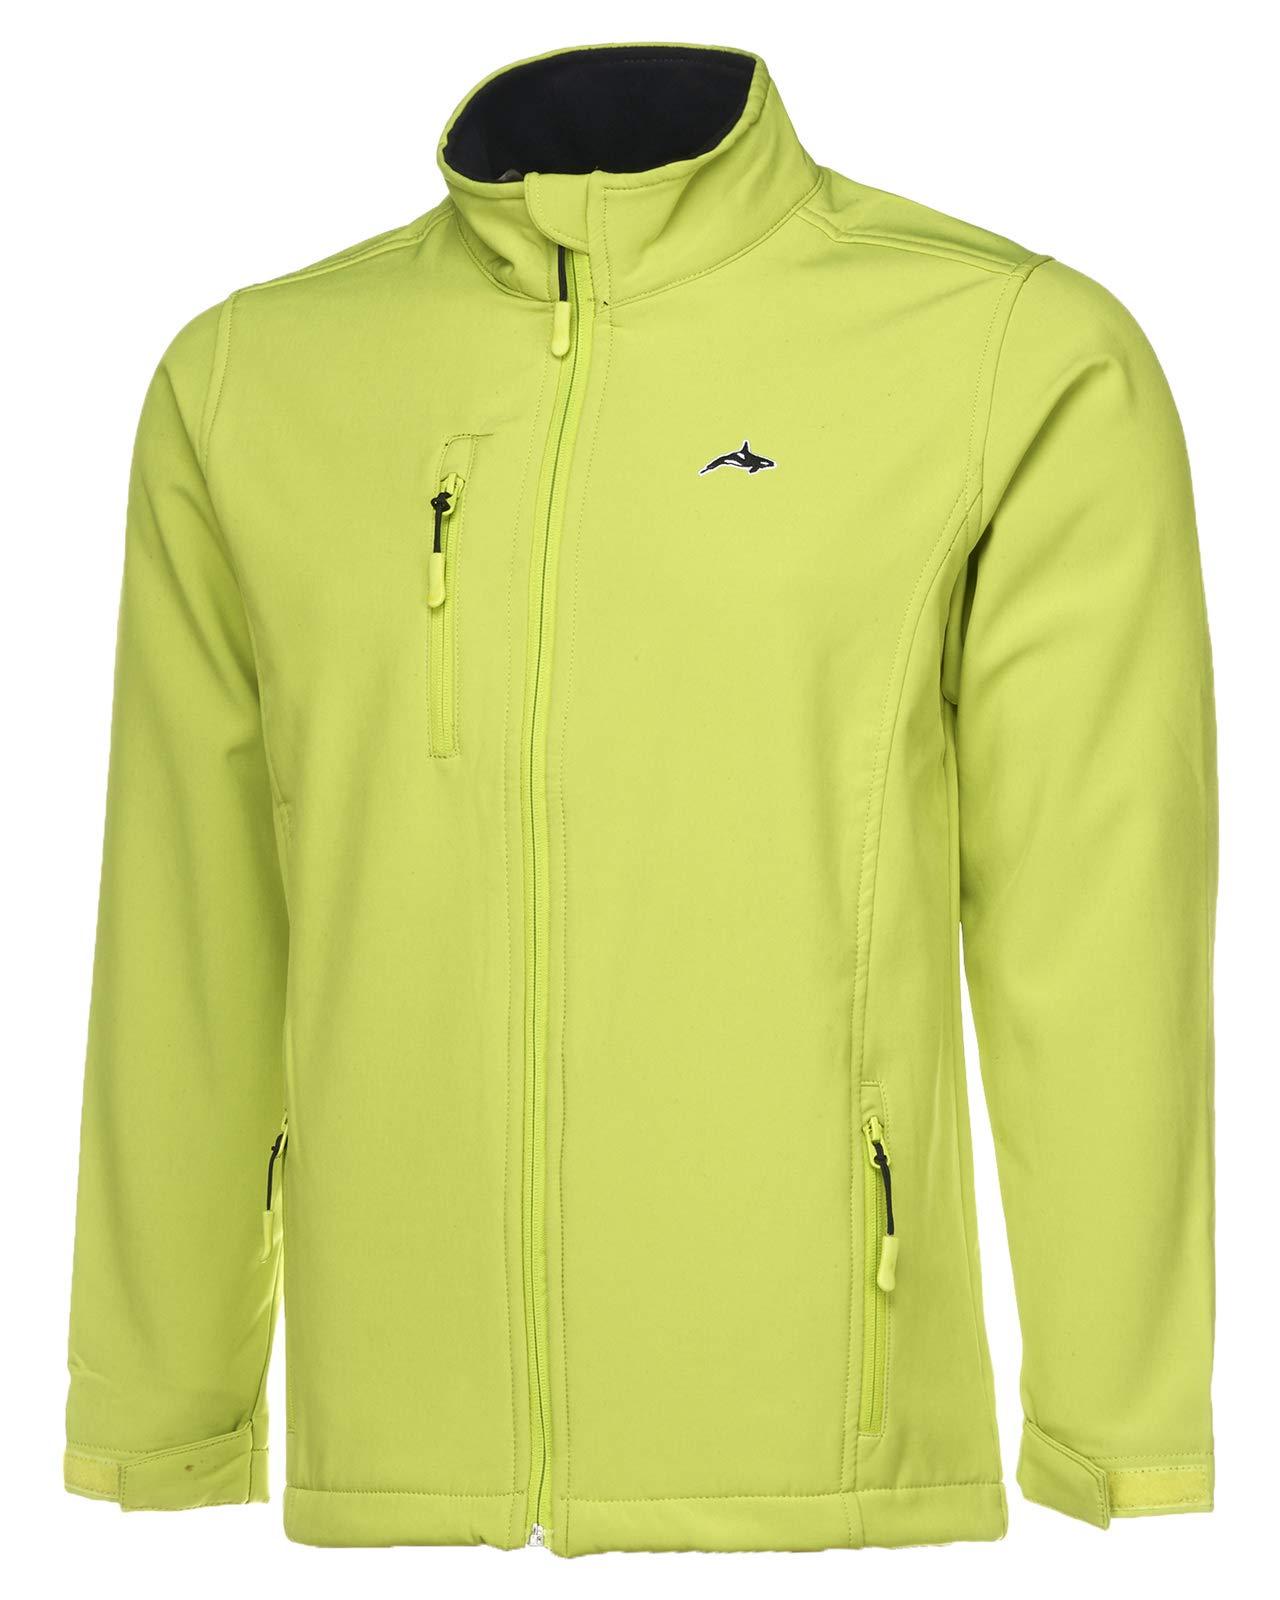 Killer Whale Softshell Fleece Jacket Mens Windproof and Waterproof